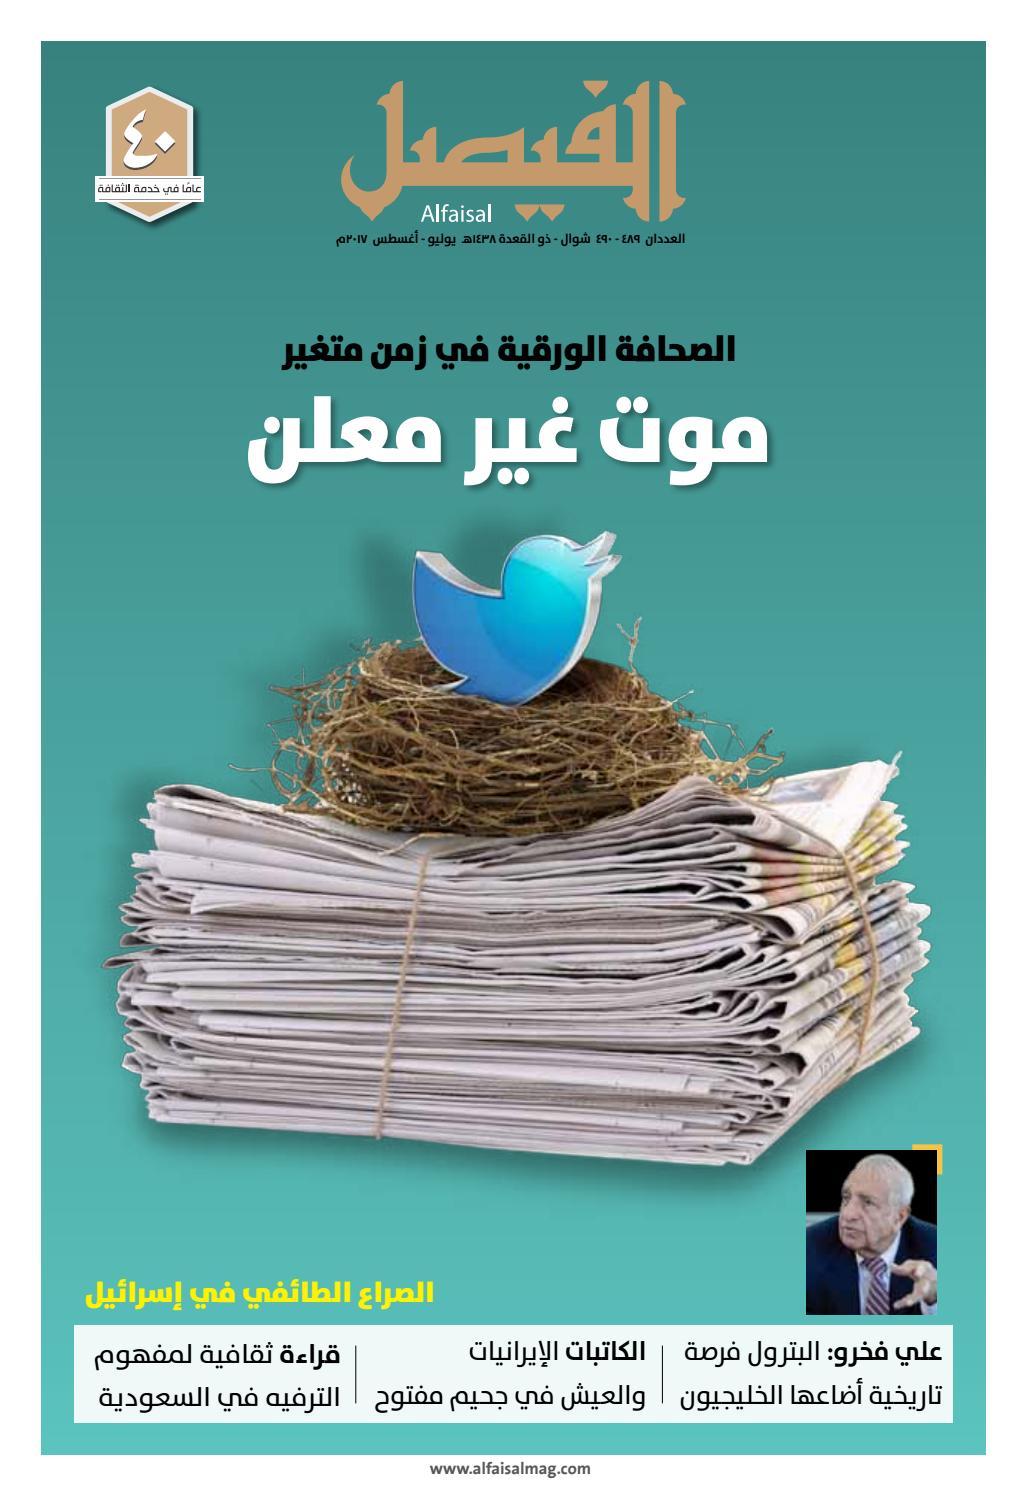 70e26bd65 assuu 489 490 مجلة الفيصل by yanal Isak - issuu